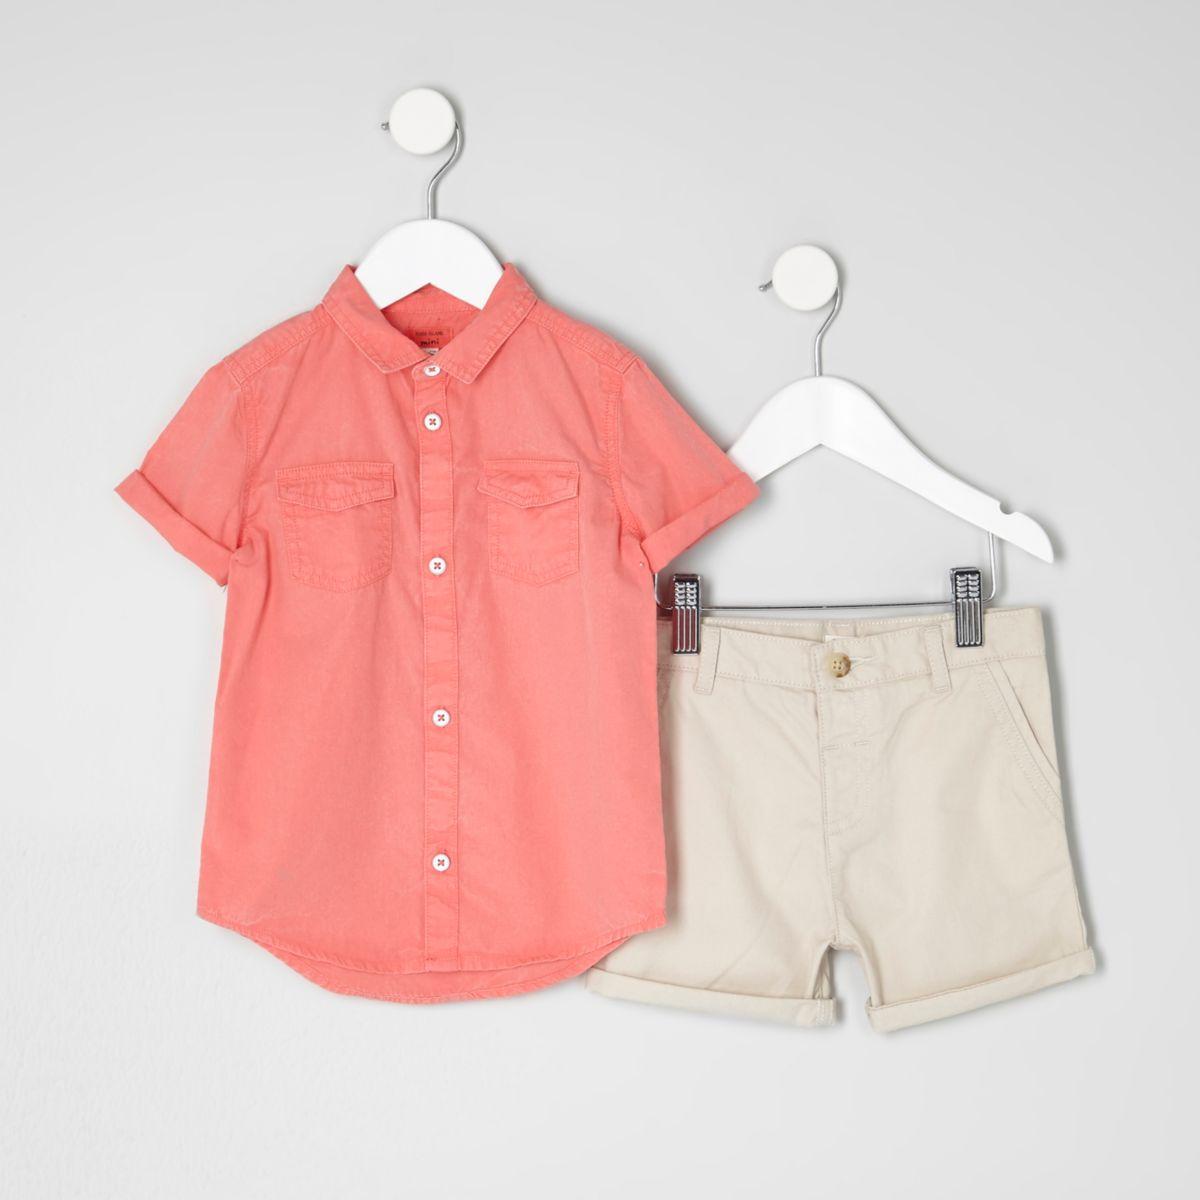 Mini boys pink shirt and chino shorts outfit